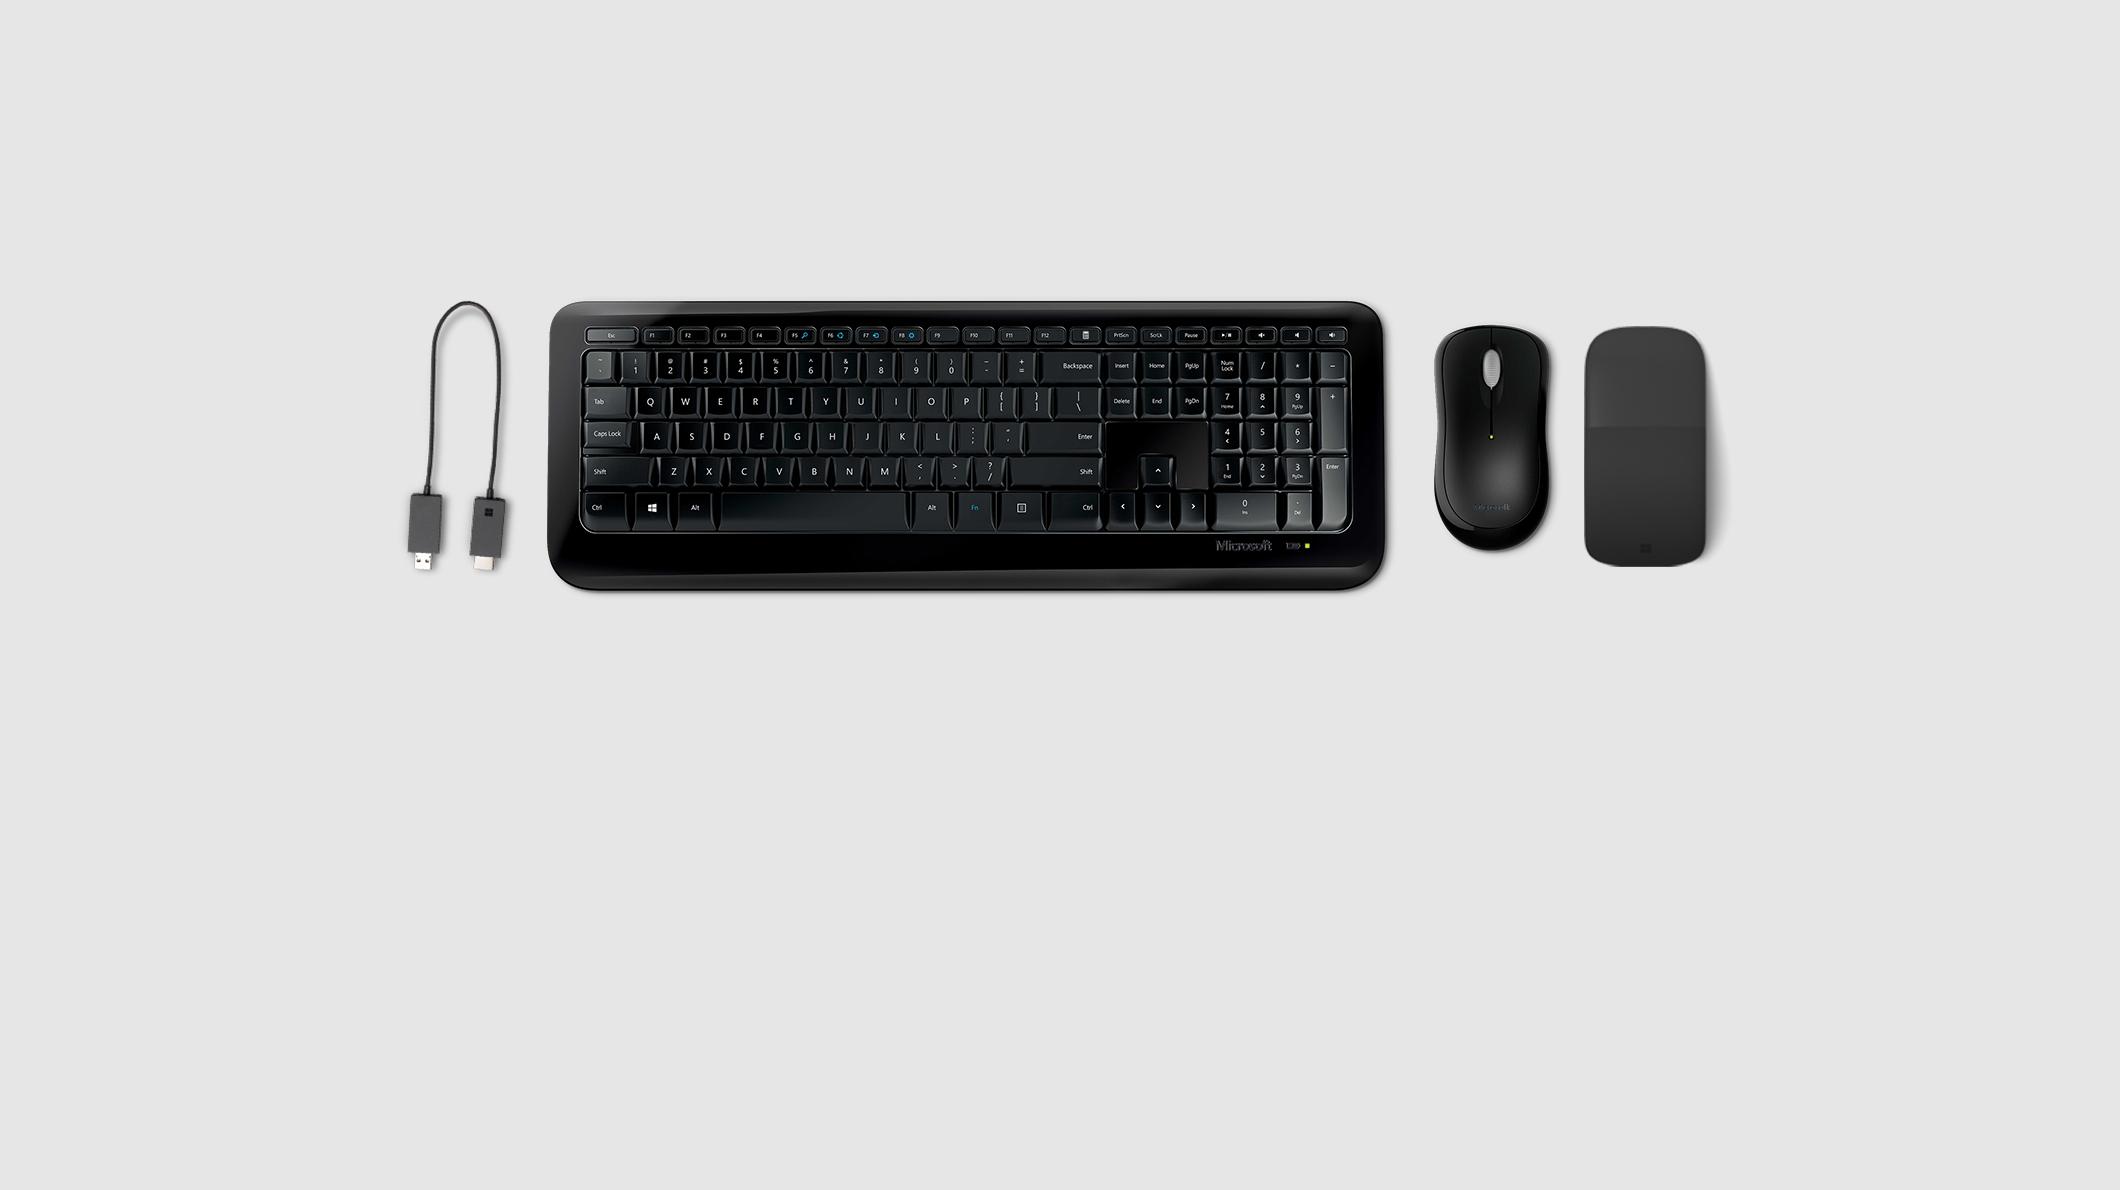 Wireless display adaptor, Surface Arc Mouse, Microsoft classic mouse, Microsoft Keyboard